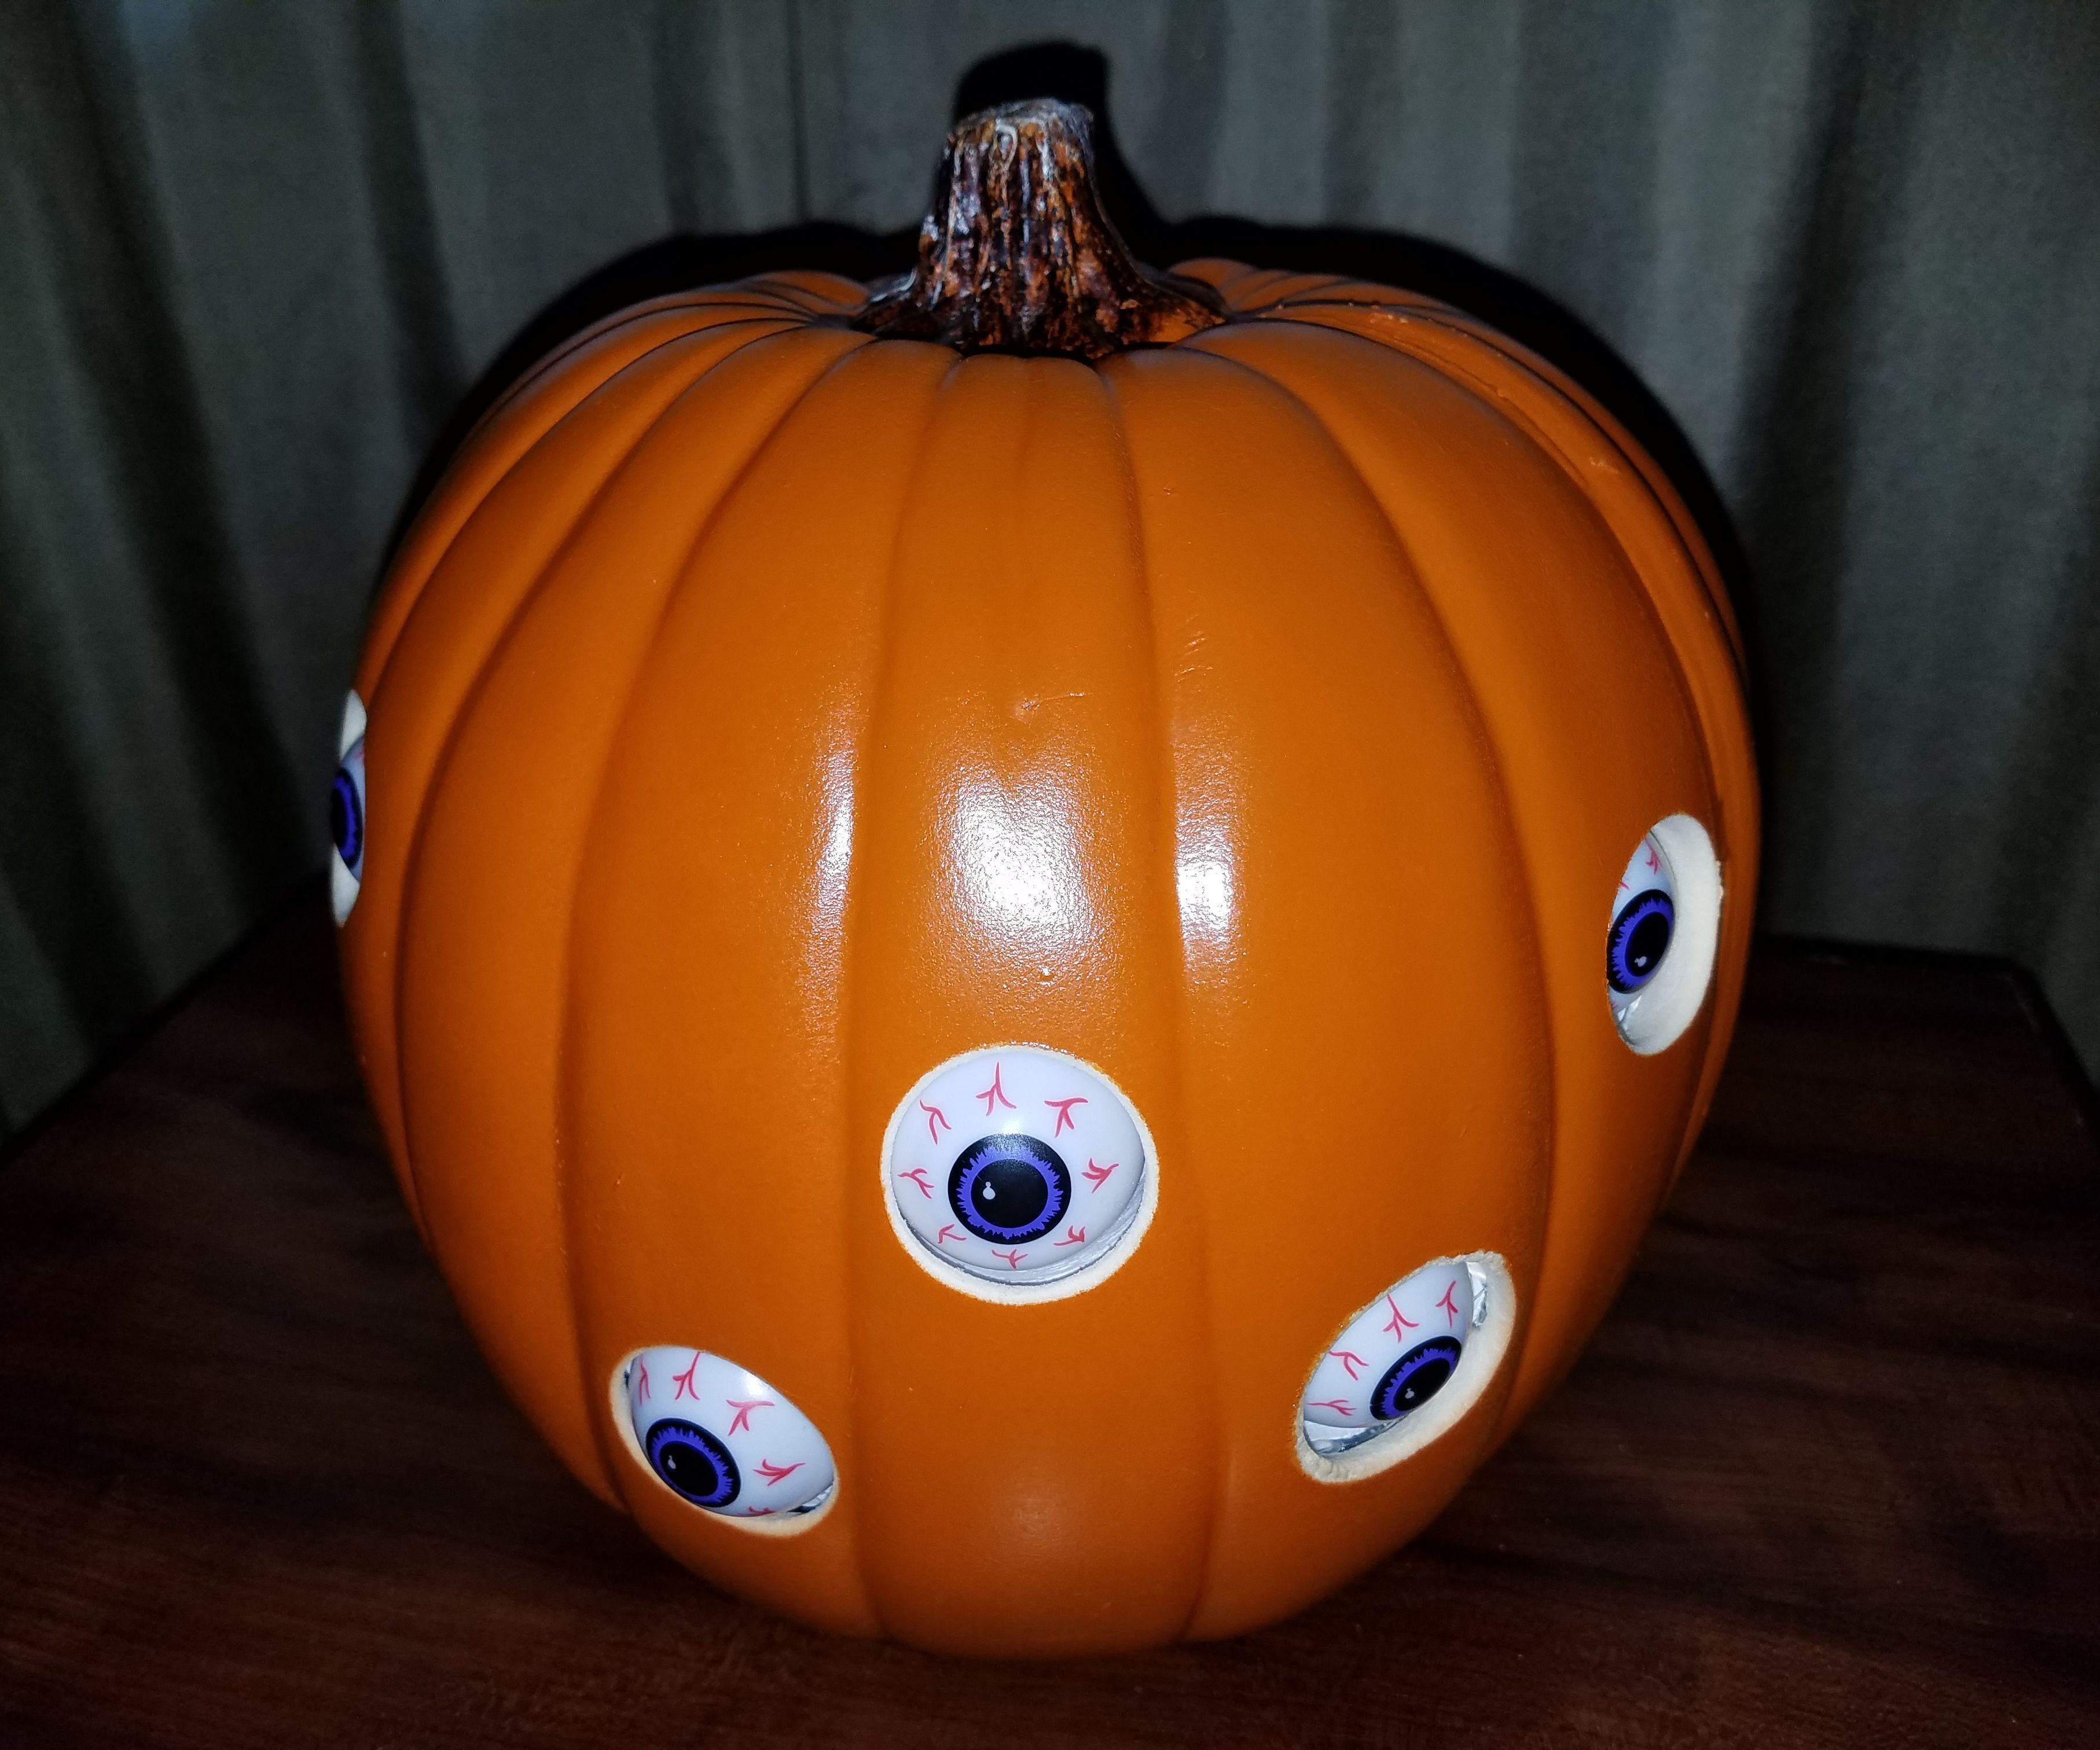 Automated Spooky Pumpkin Eyes